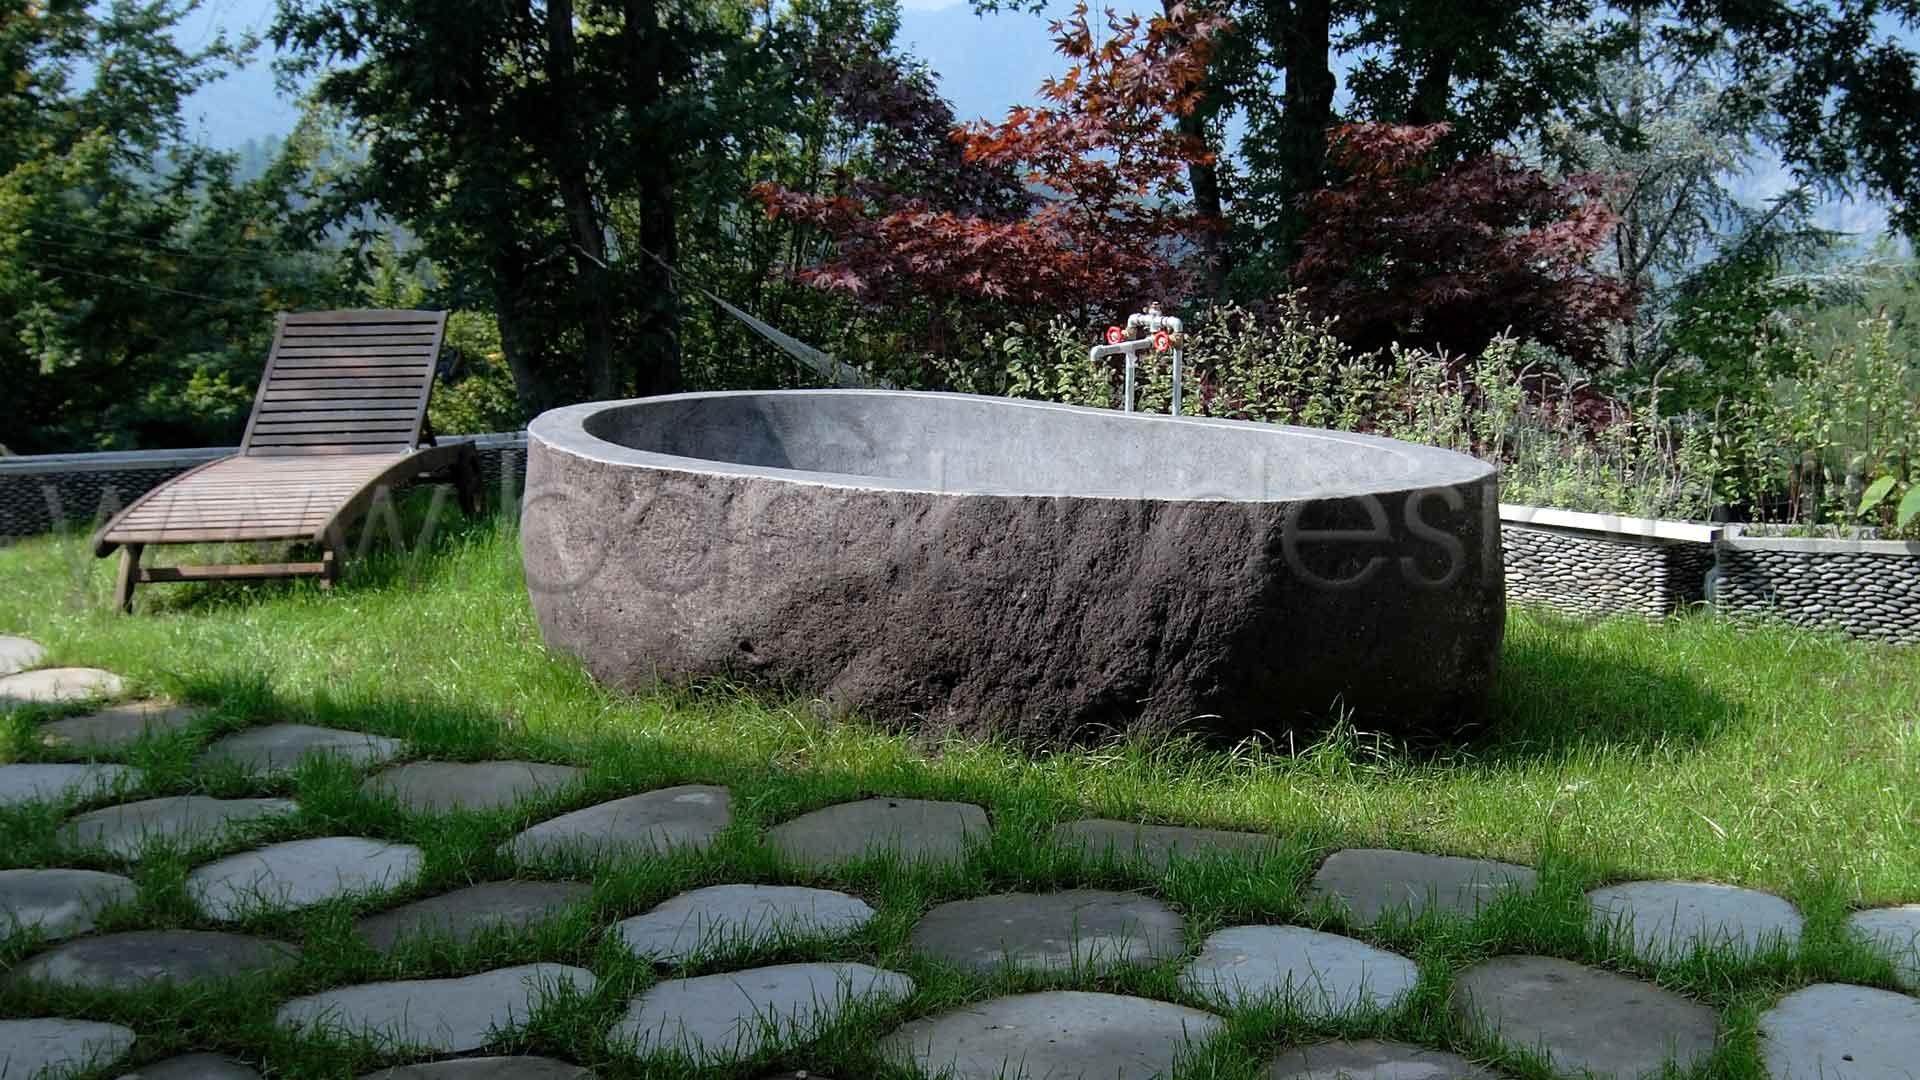 Vendita Vasche Da Bagno Milano.Vasca Da Bagno In Pietra Riverstone 240x130 H65 Cm Bambu